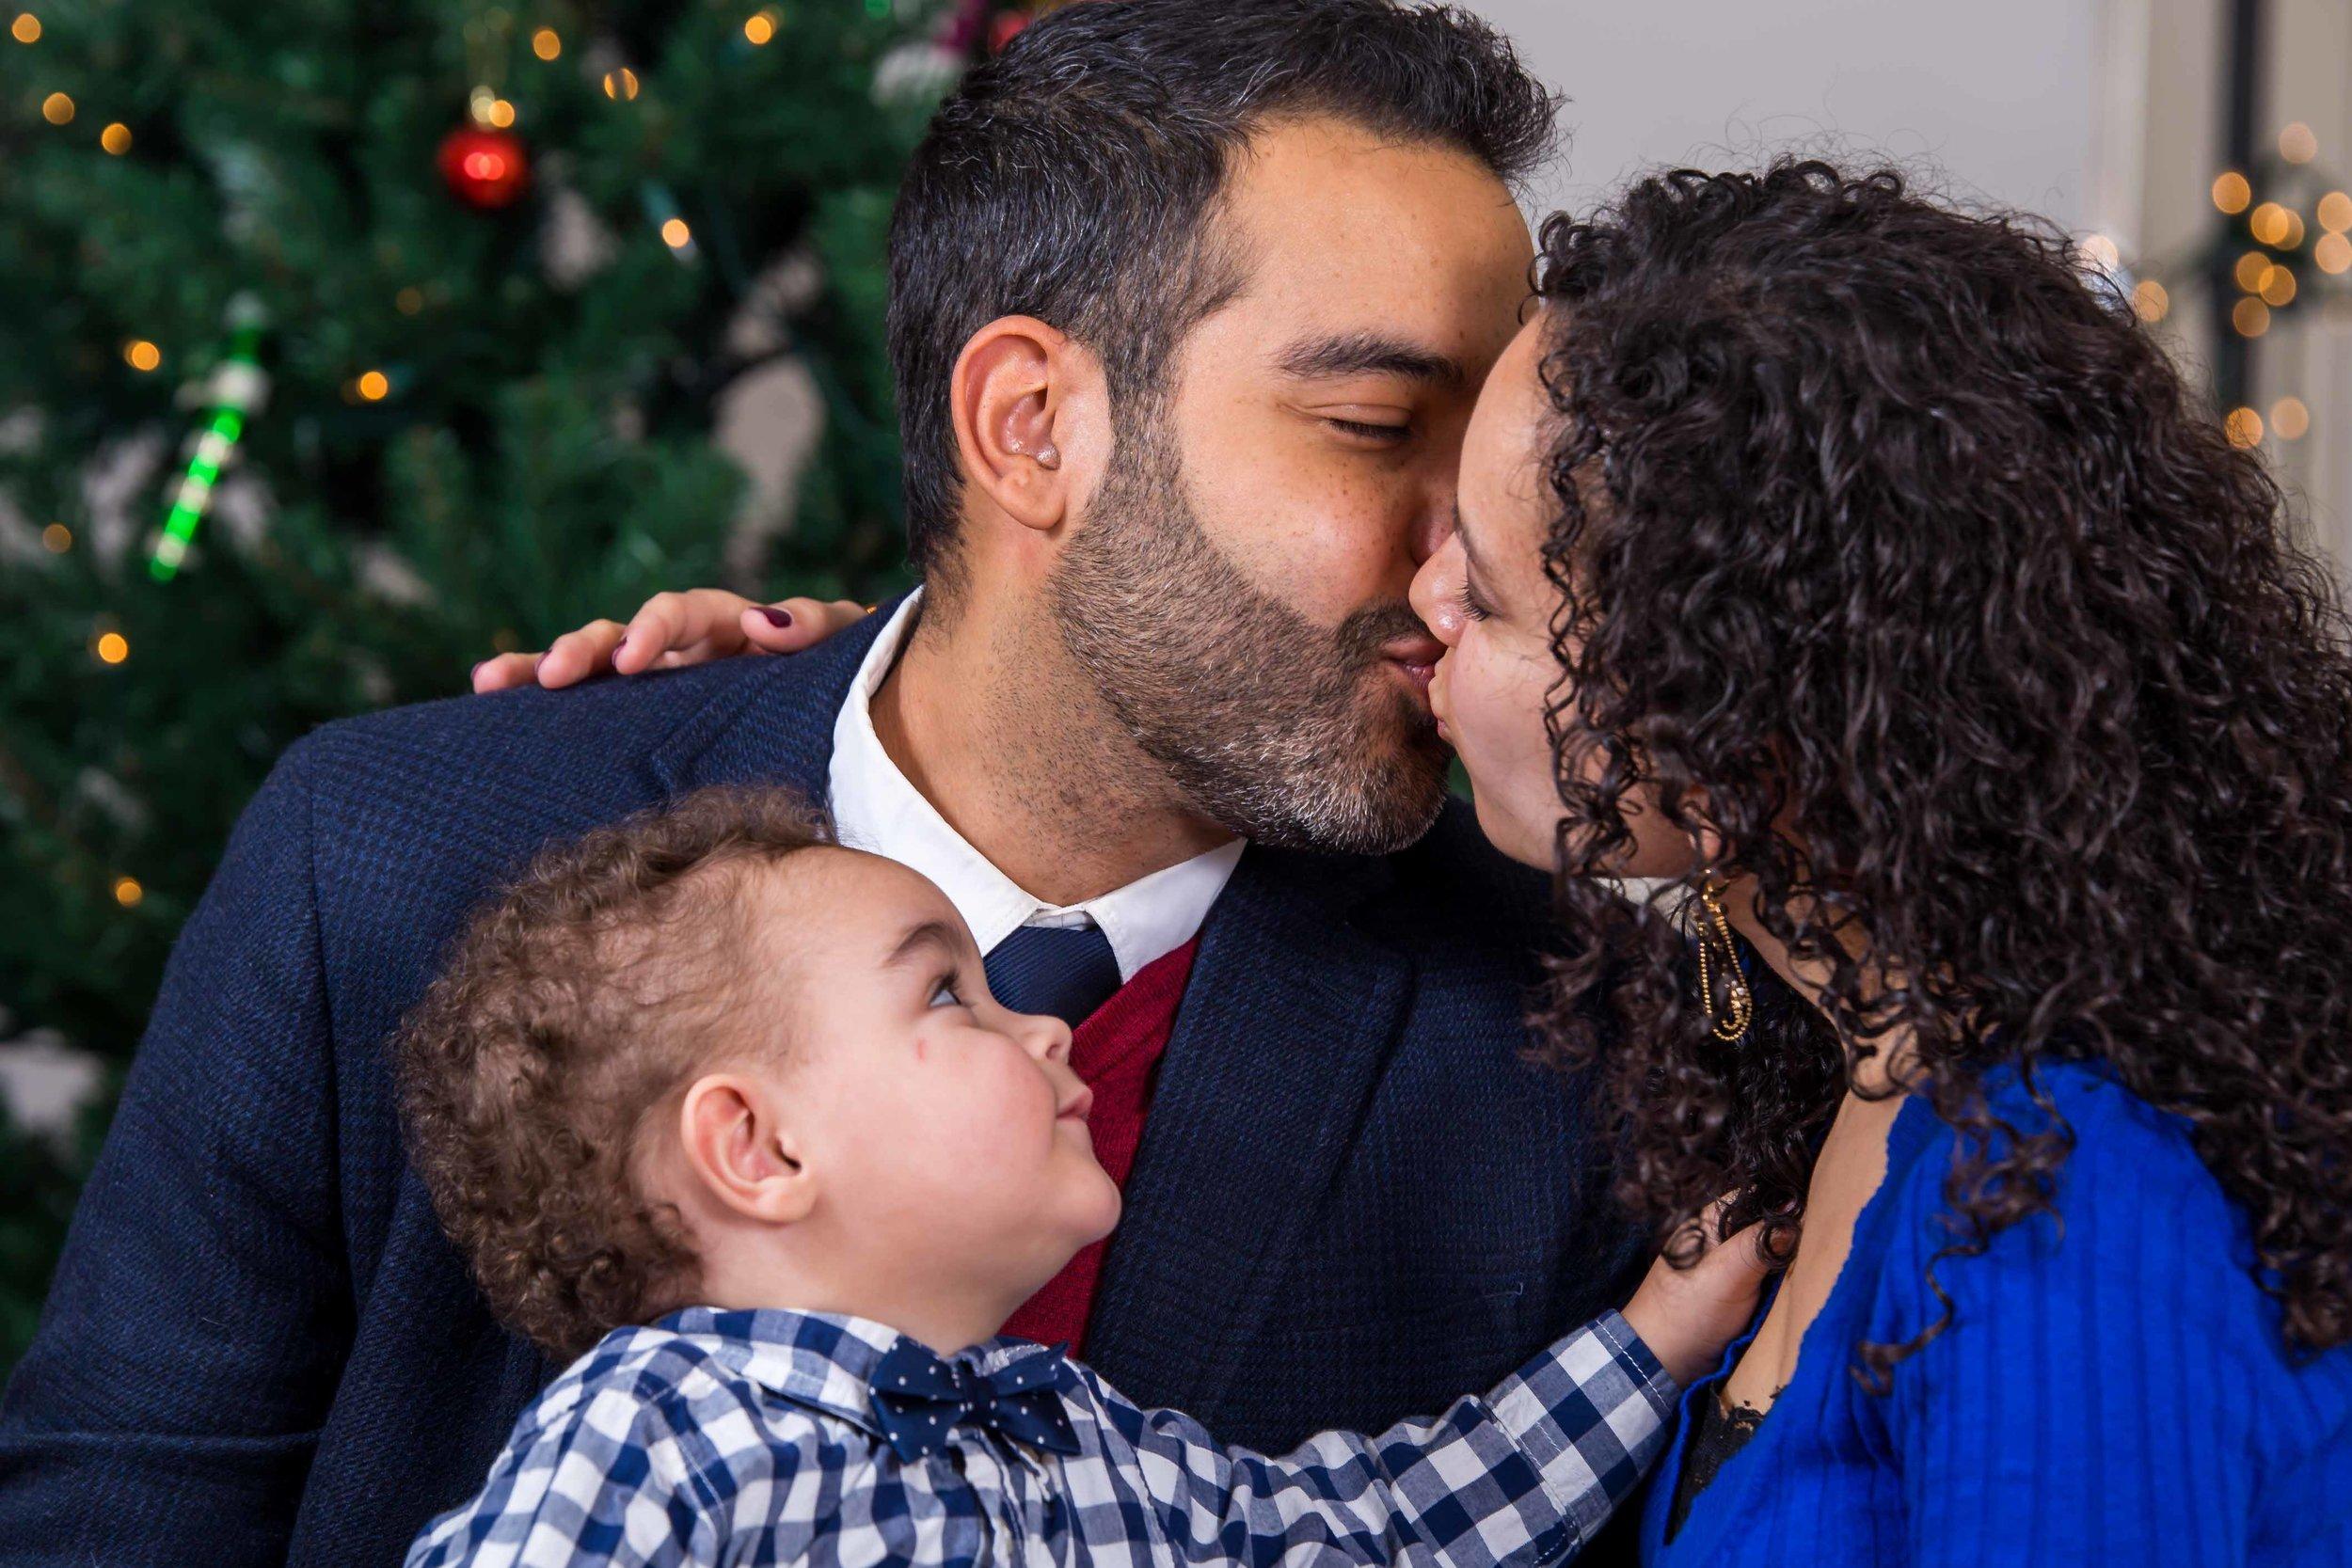 Nyc-holiday-photographs-photographer-family-15.jpg